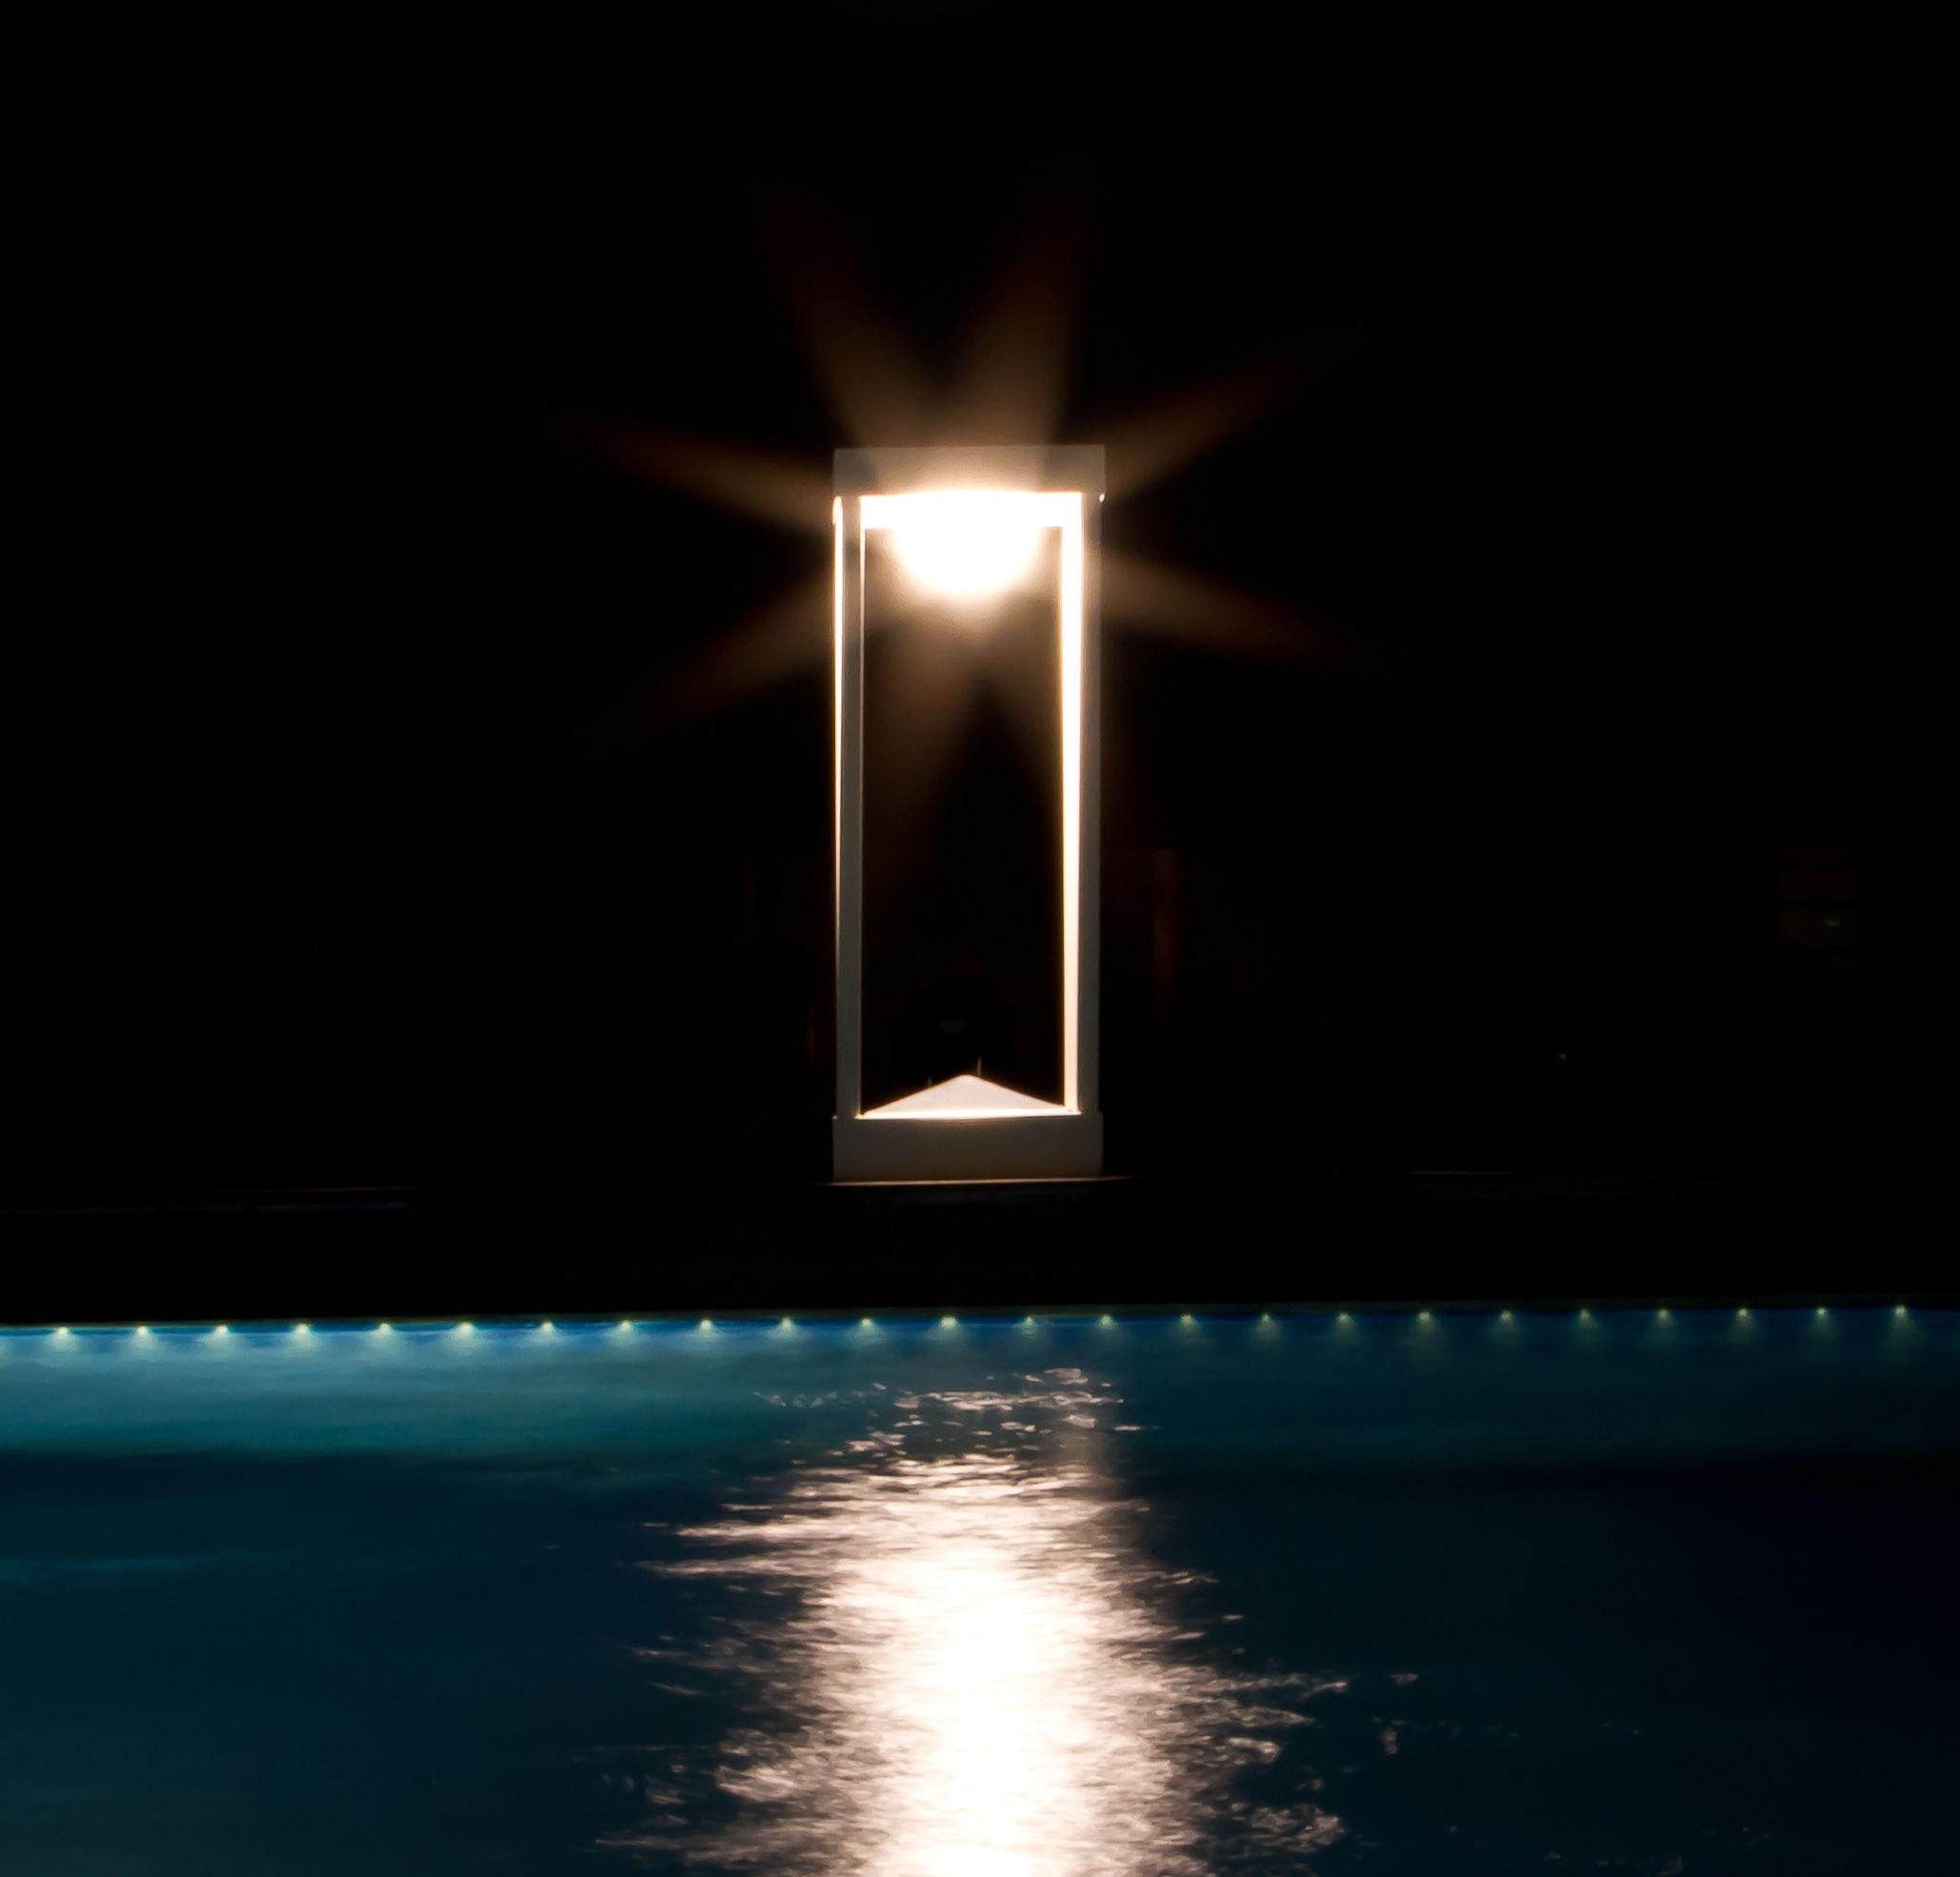 la lampe parc s solar lamp led wireless h 30 cm black by maiori. Black Bedroom Furniture Sets. Home Design Ideas